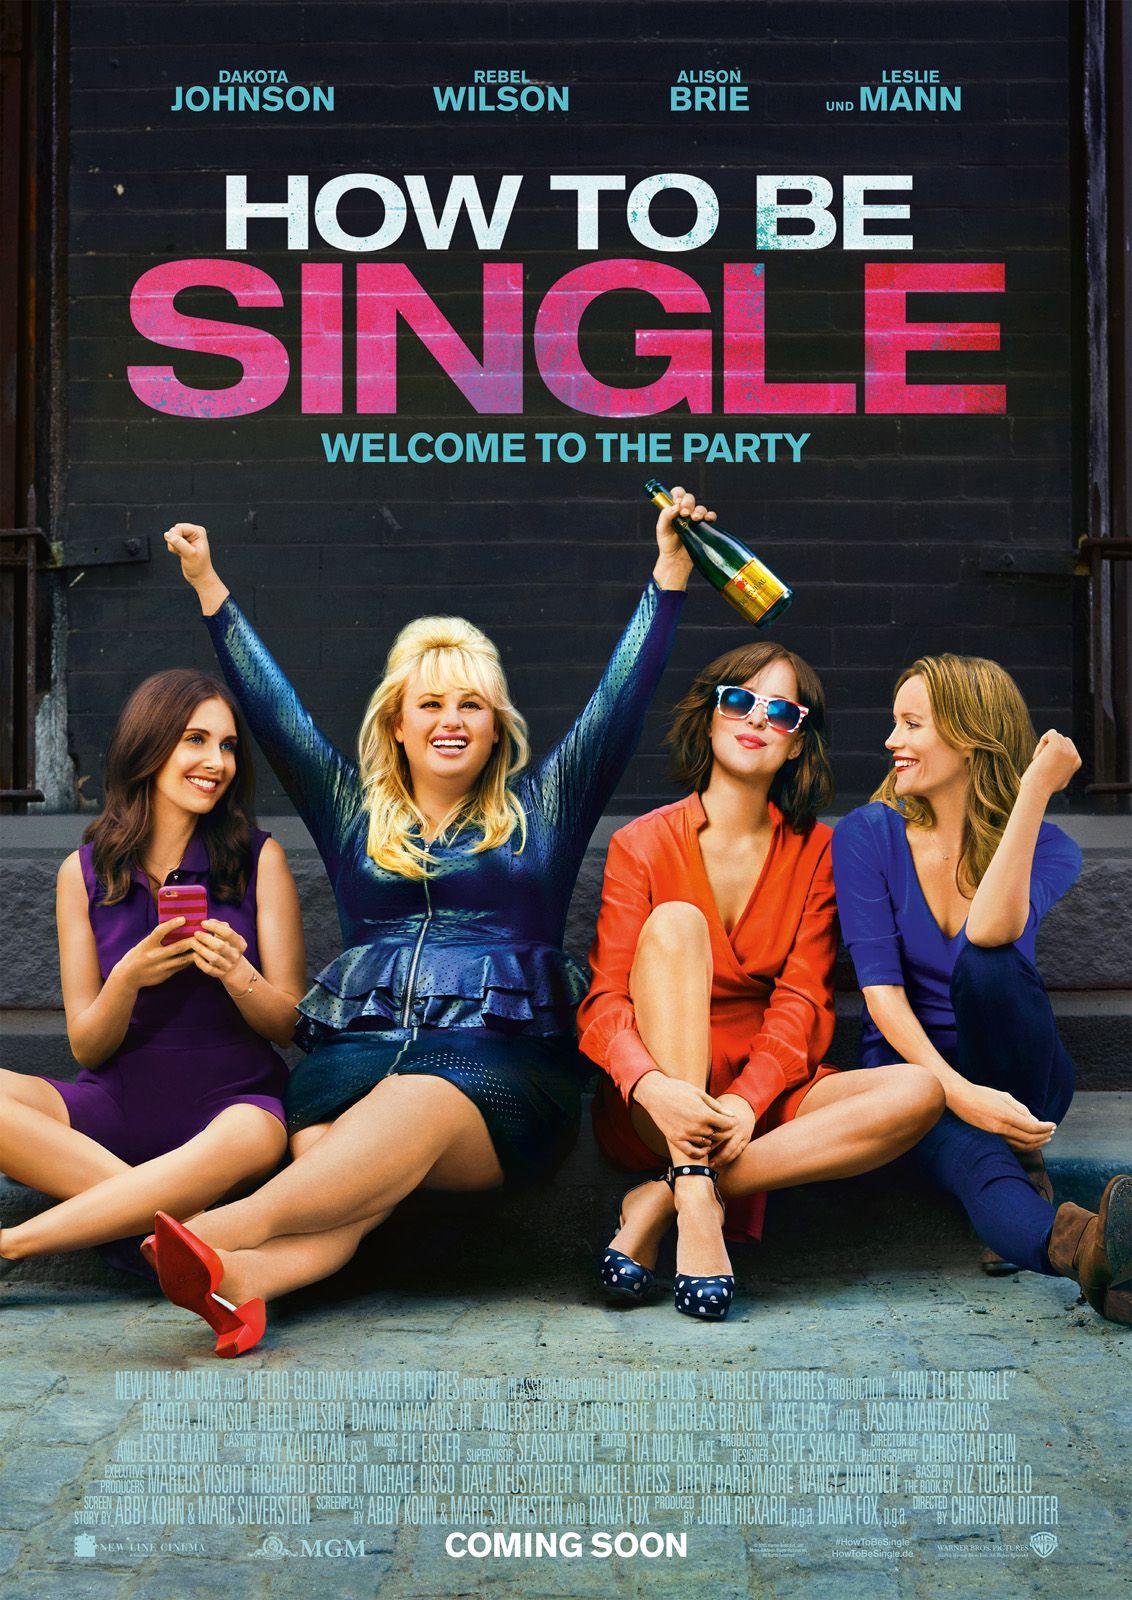 How to be single | 코미디 영화, 영화, 영화 포스터